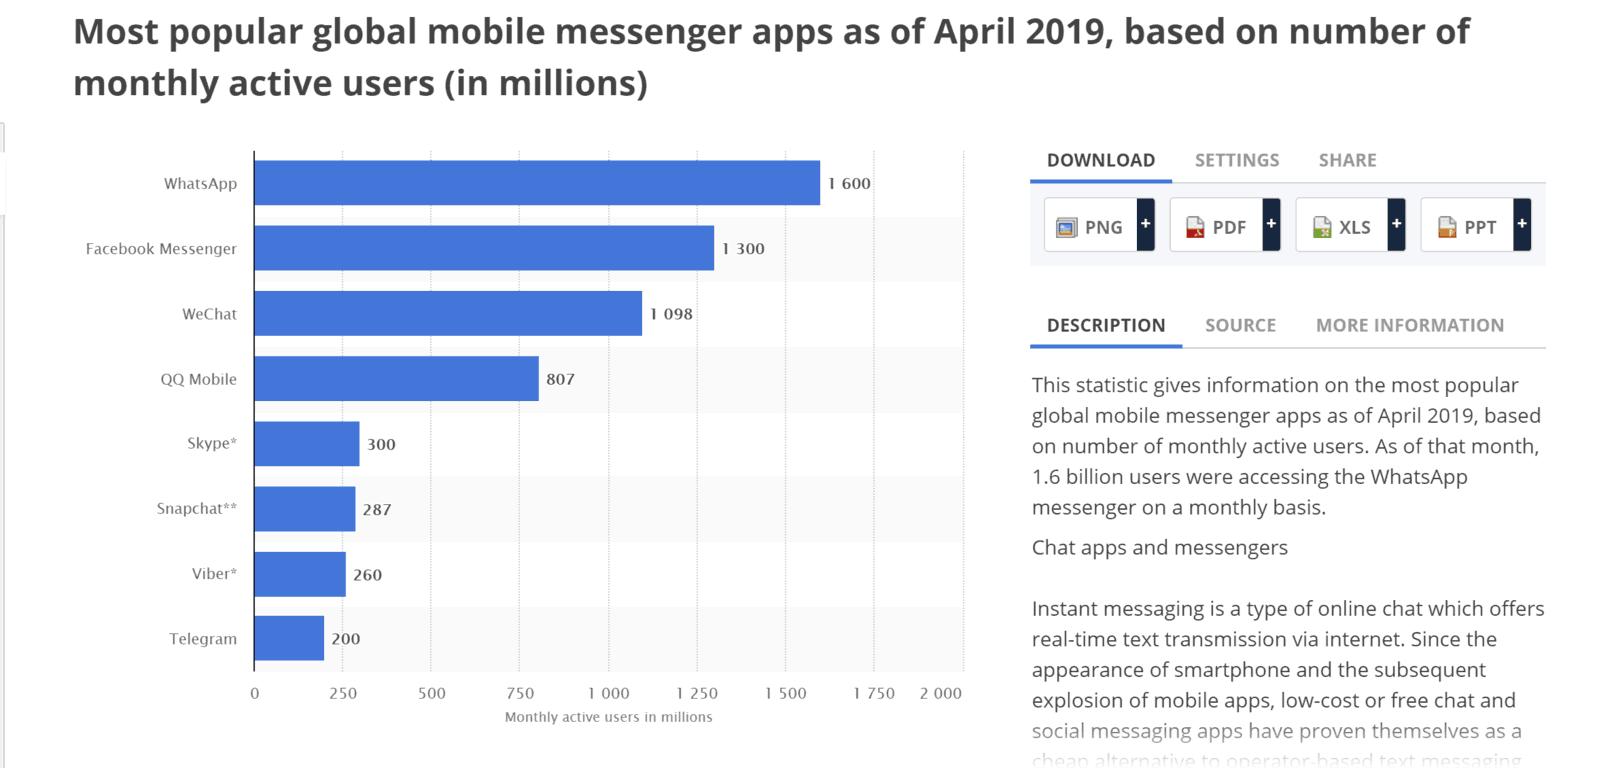 Skype brings screen sharing to mobile OnMSFT.com June 4, 2019